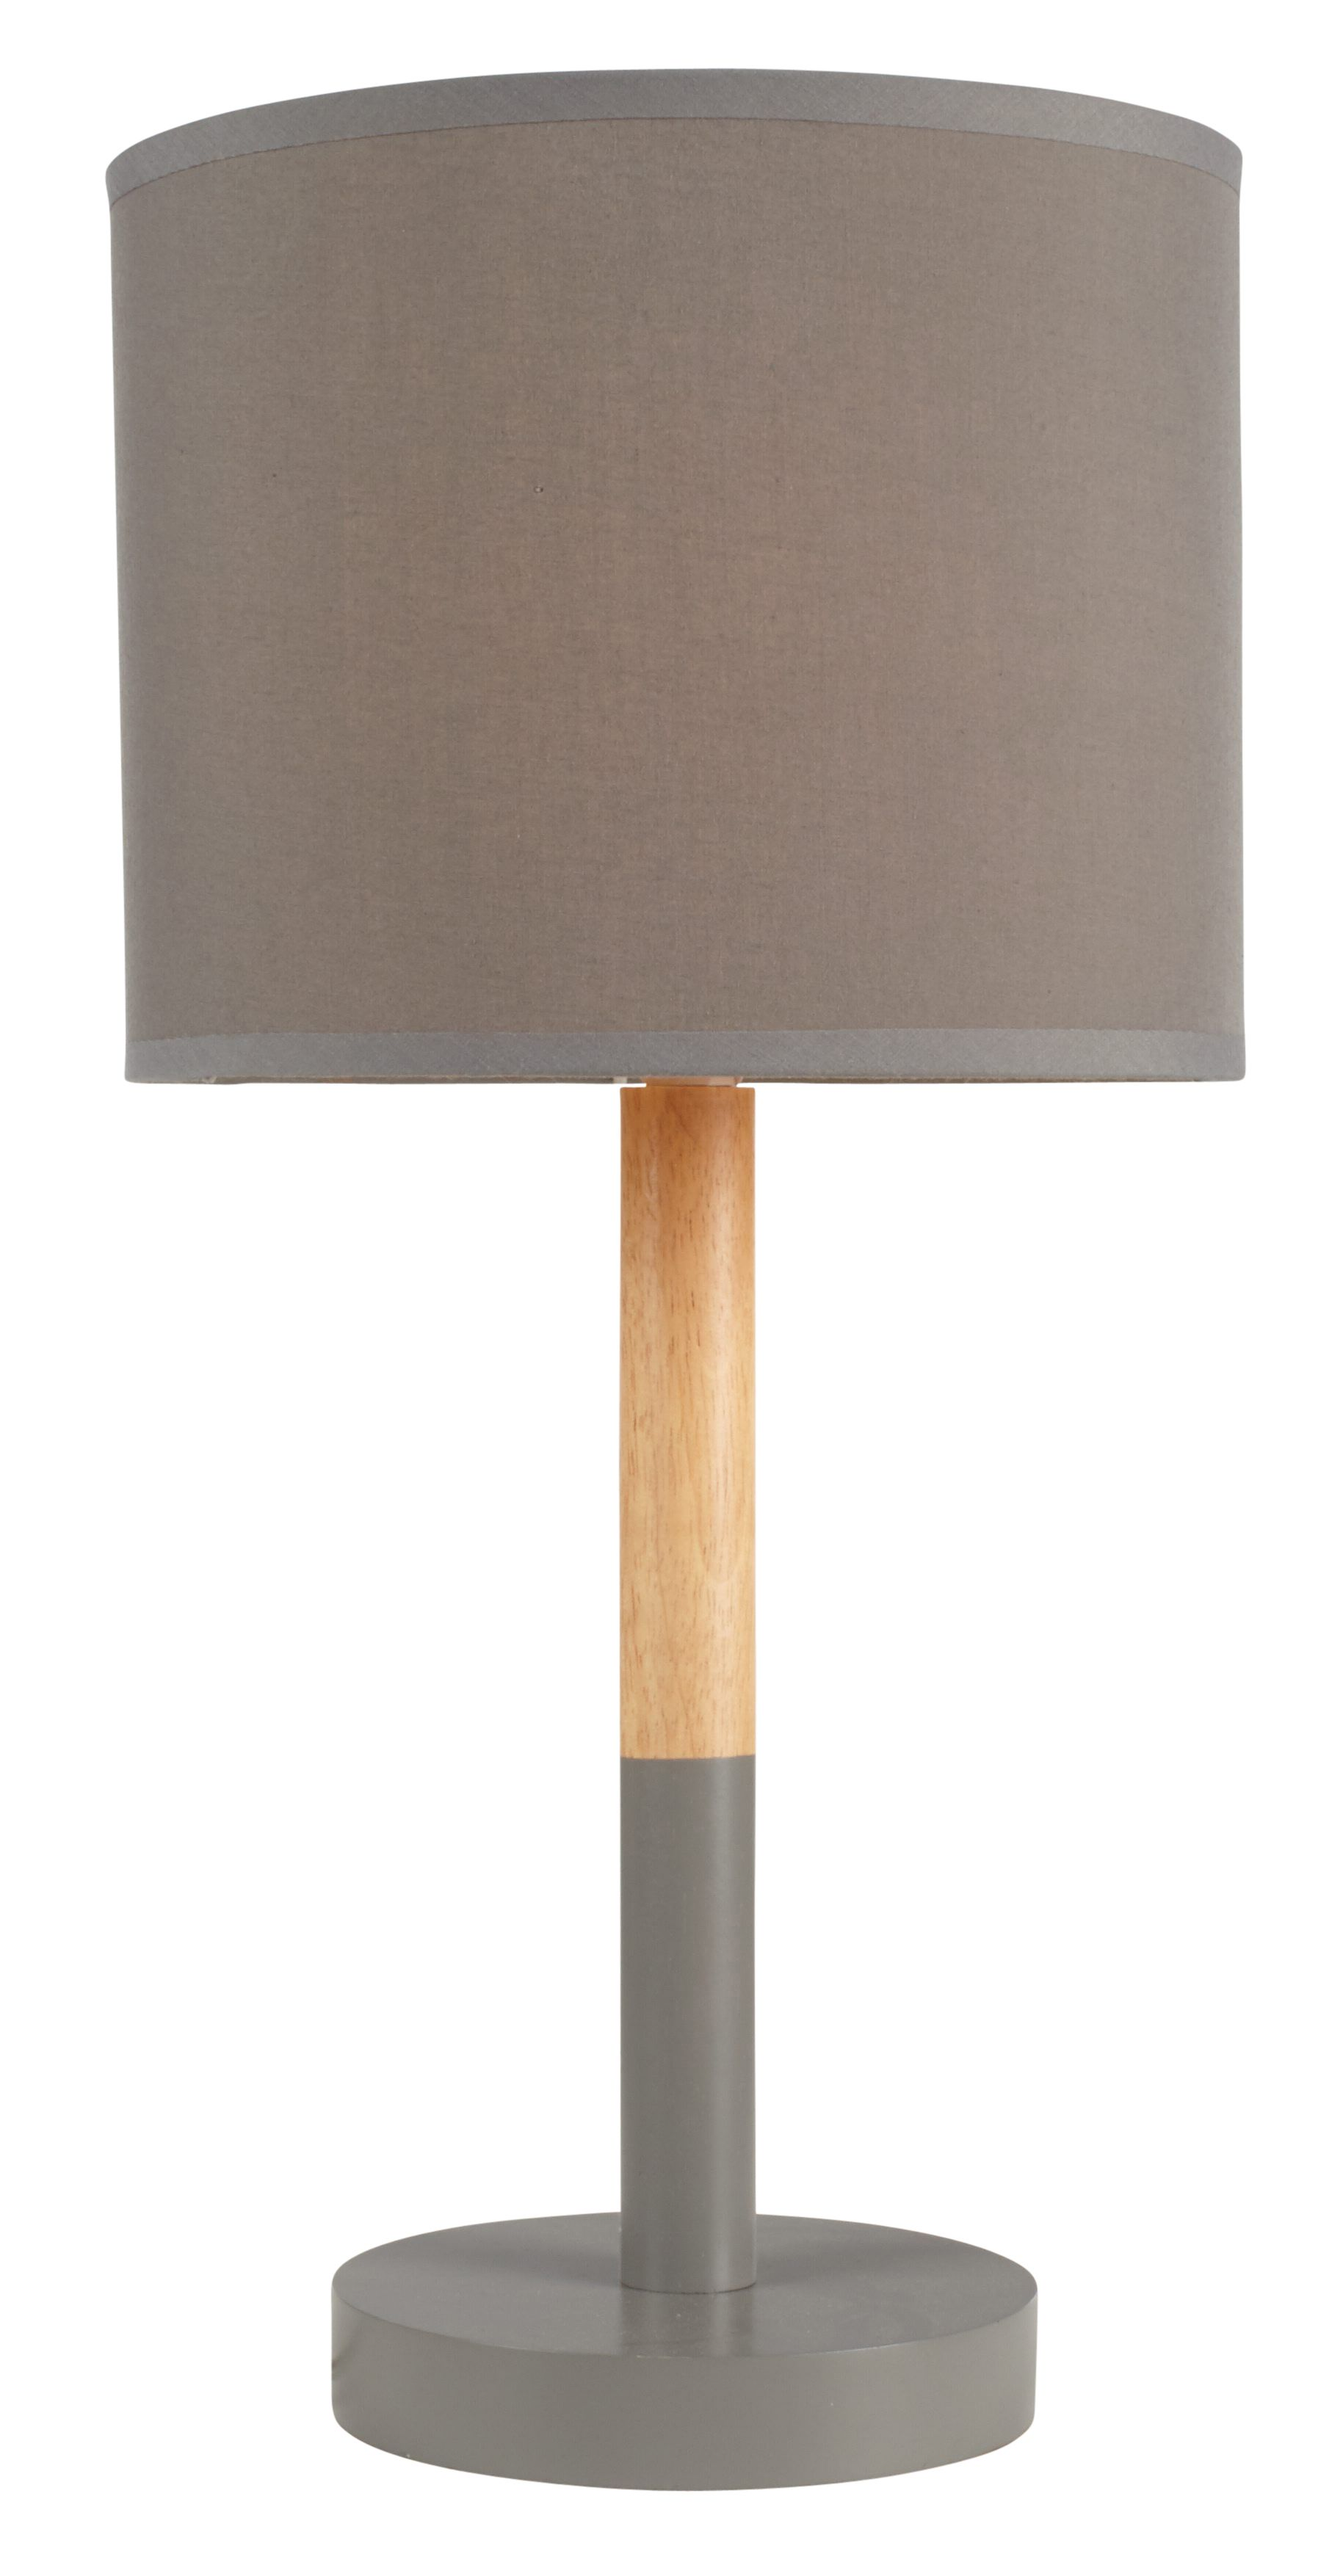 Lampe Luminaires Calais GrisTendance À Poser LightingTable n0wm8vNO